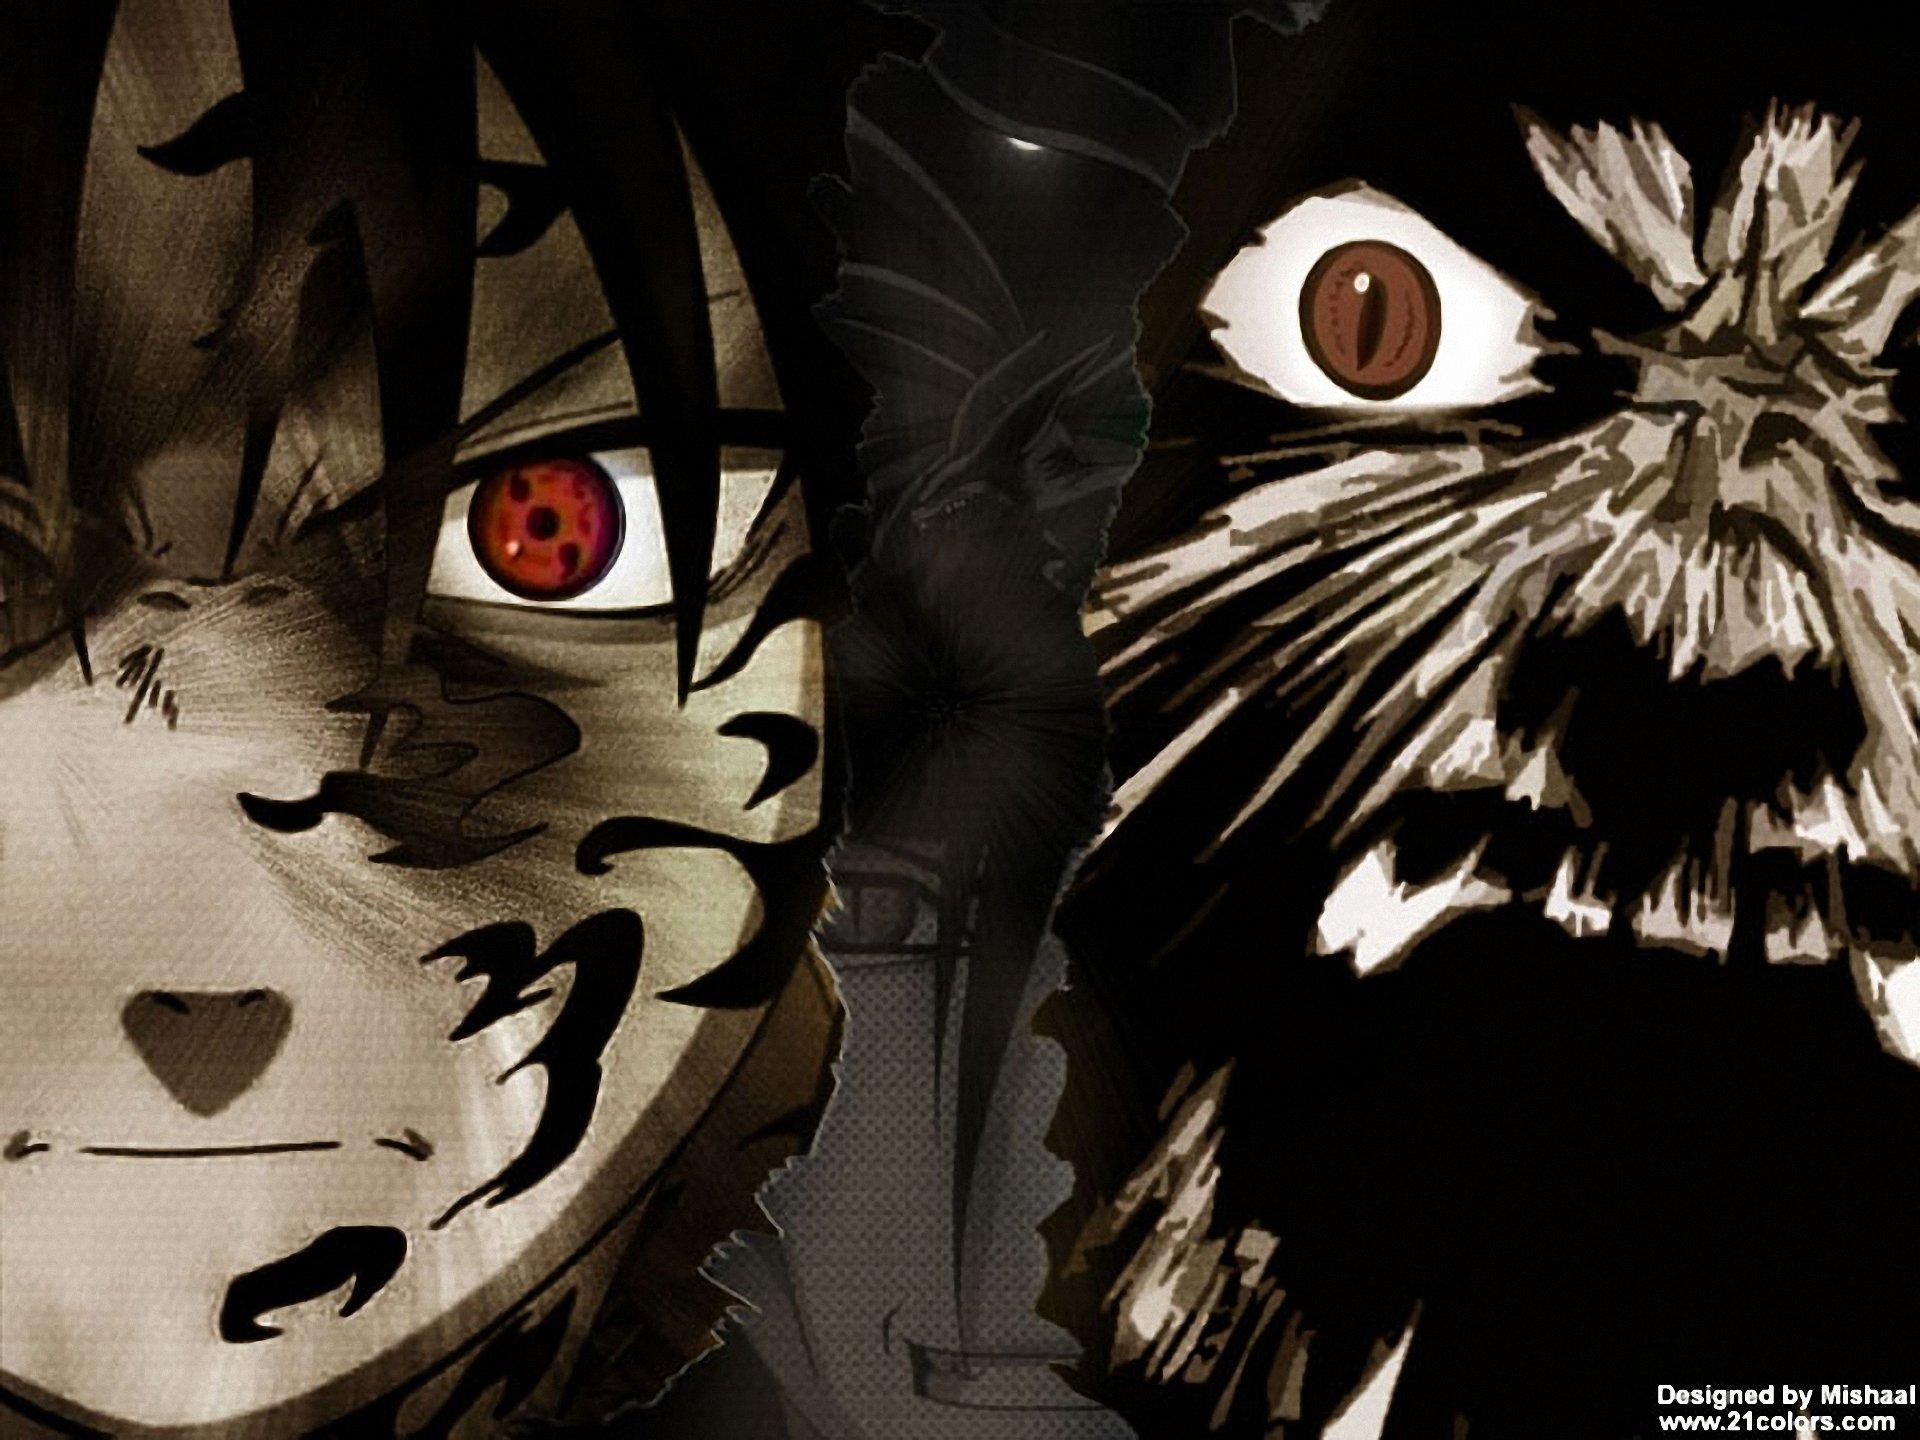 568 Sasuke Uchiha HD Wallpapers | Backgrounds - Wallpaper Abyss